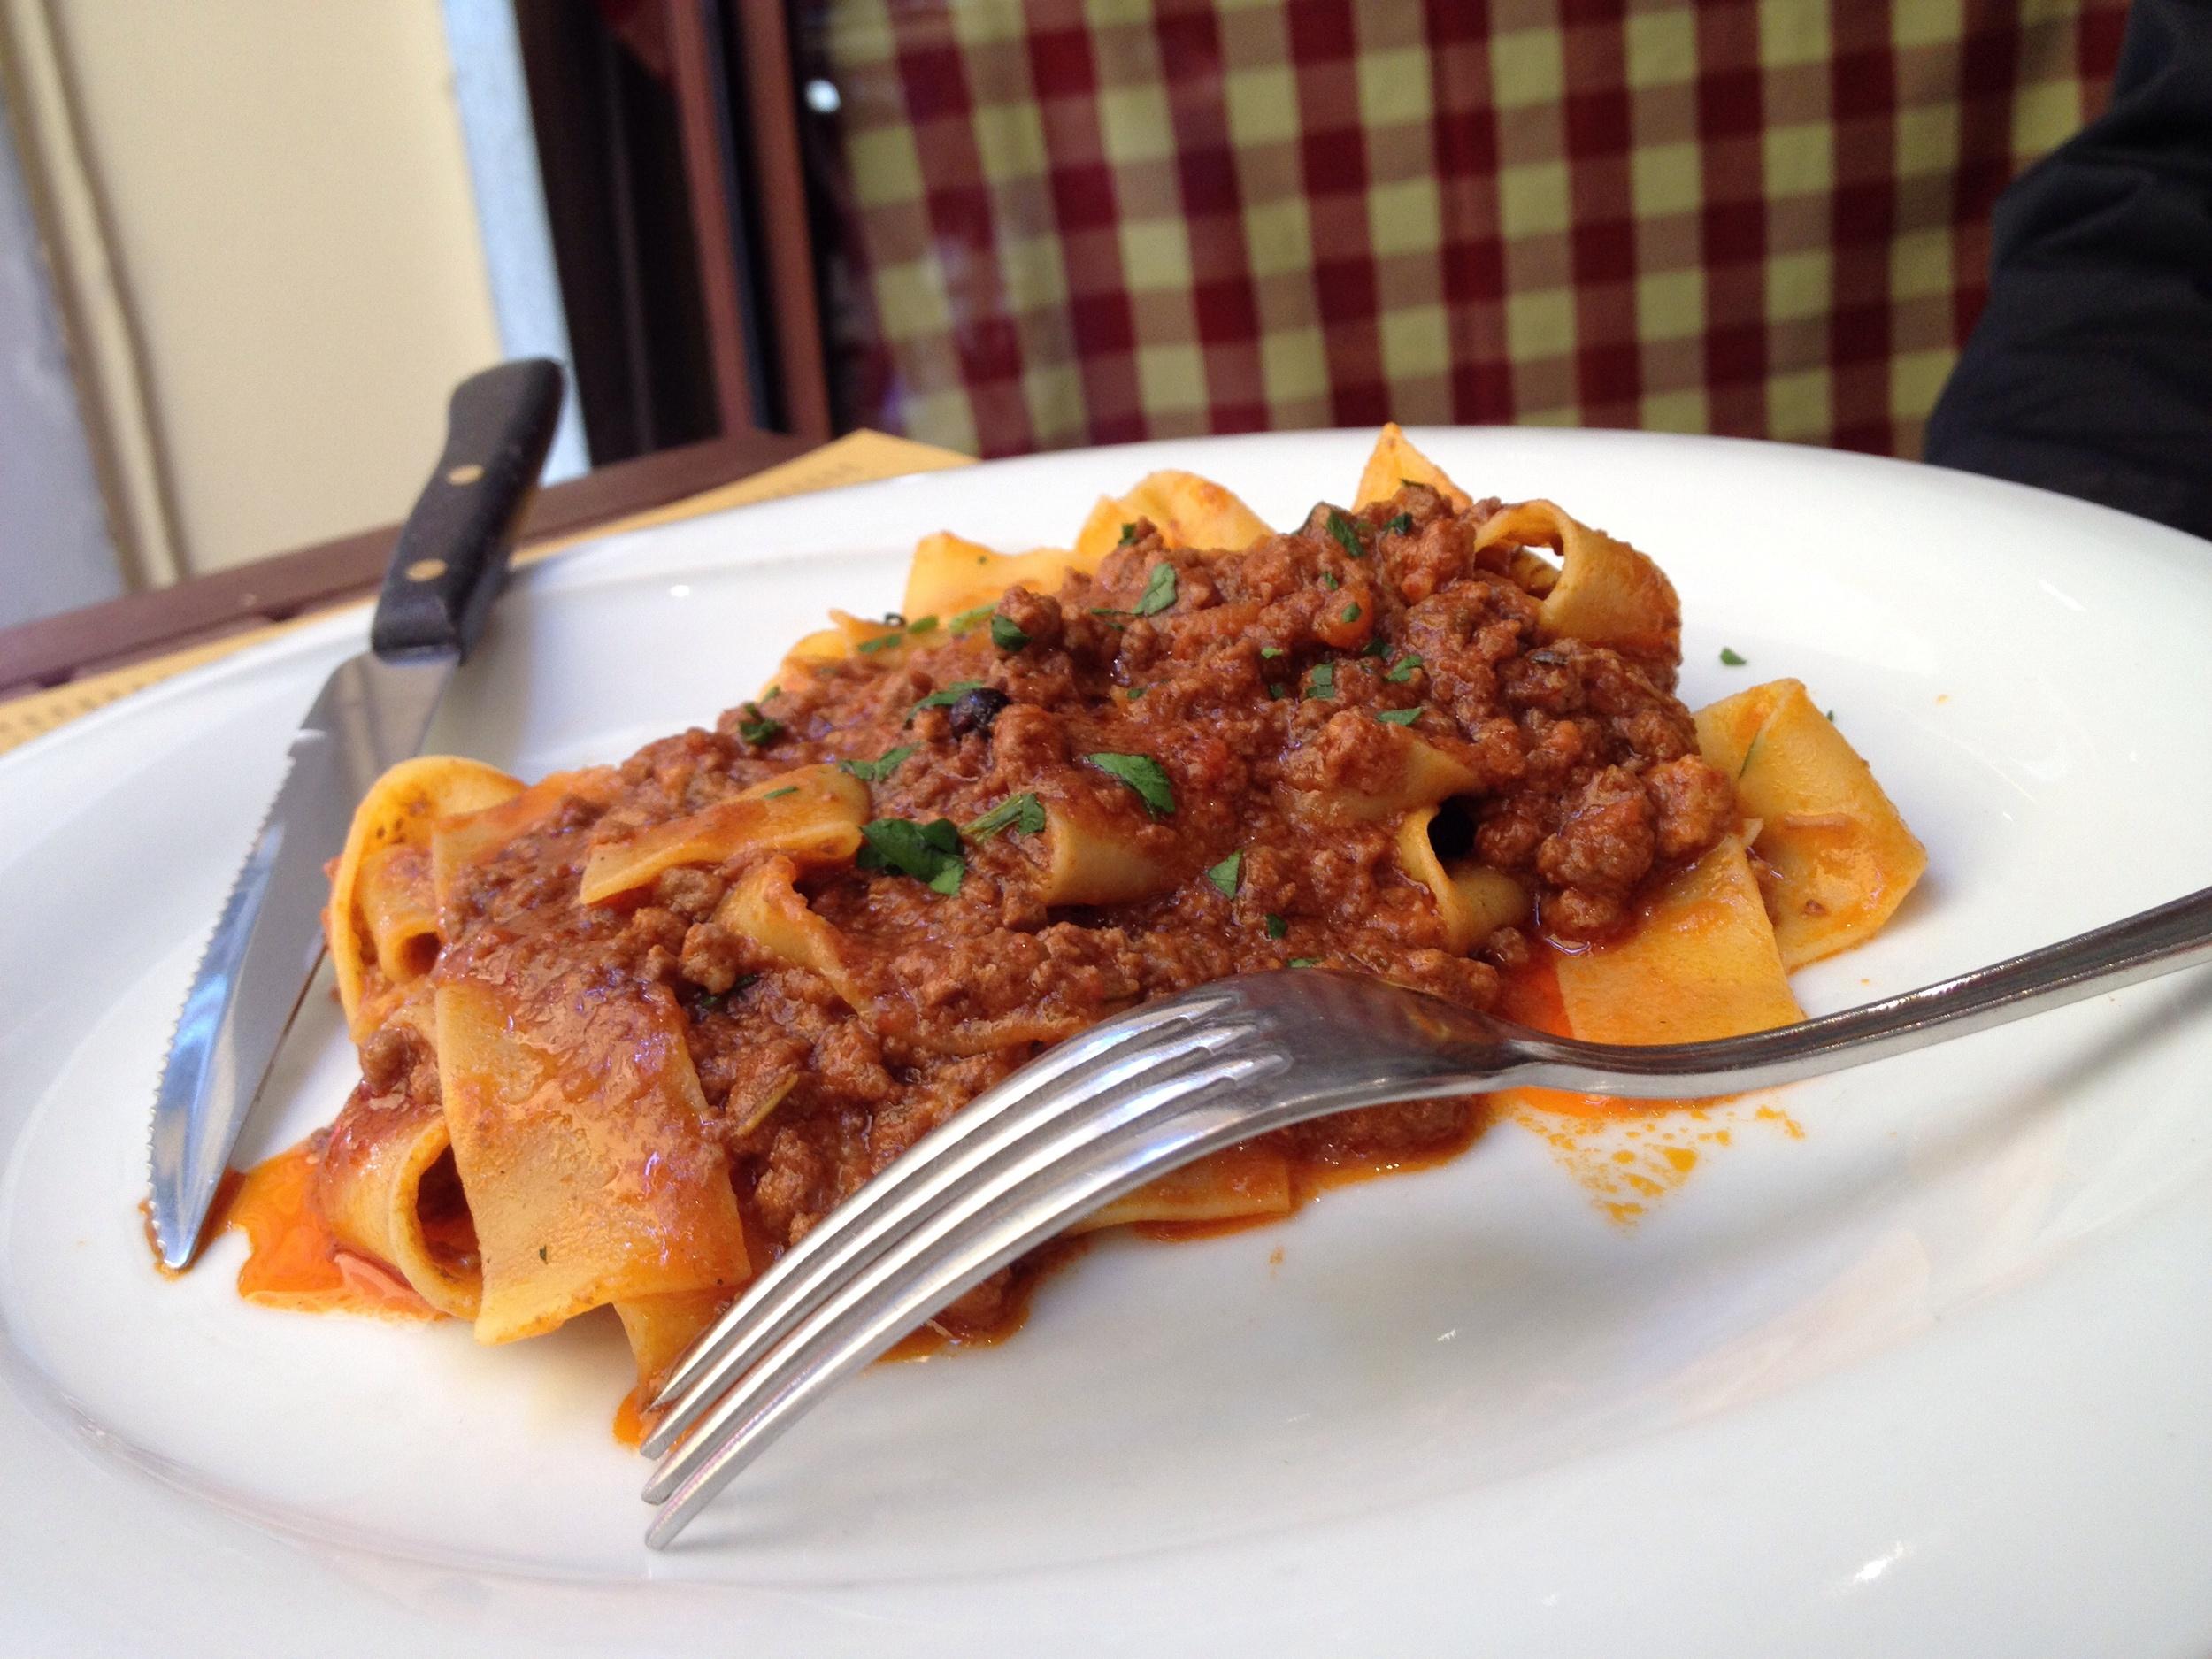 Pappardelle al Cinghiale (pasta with wild boar)